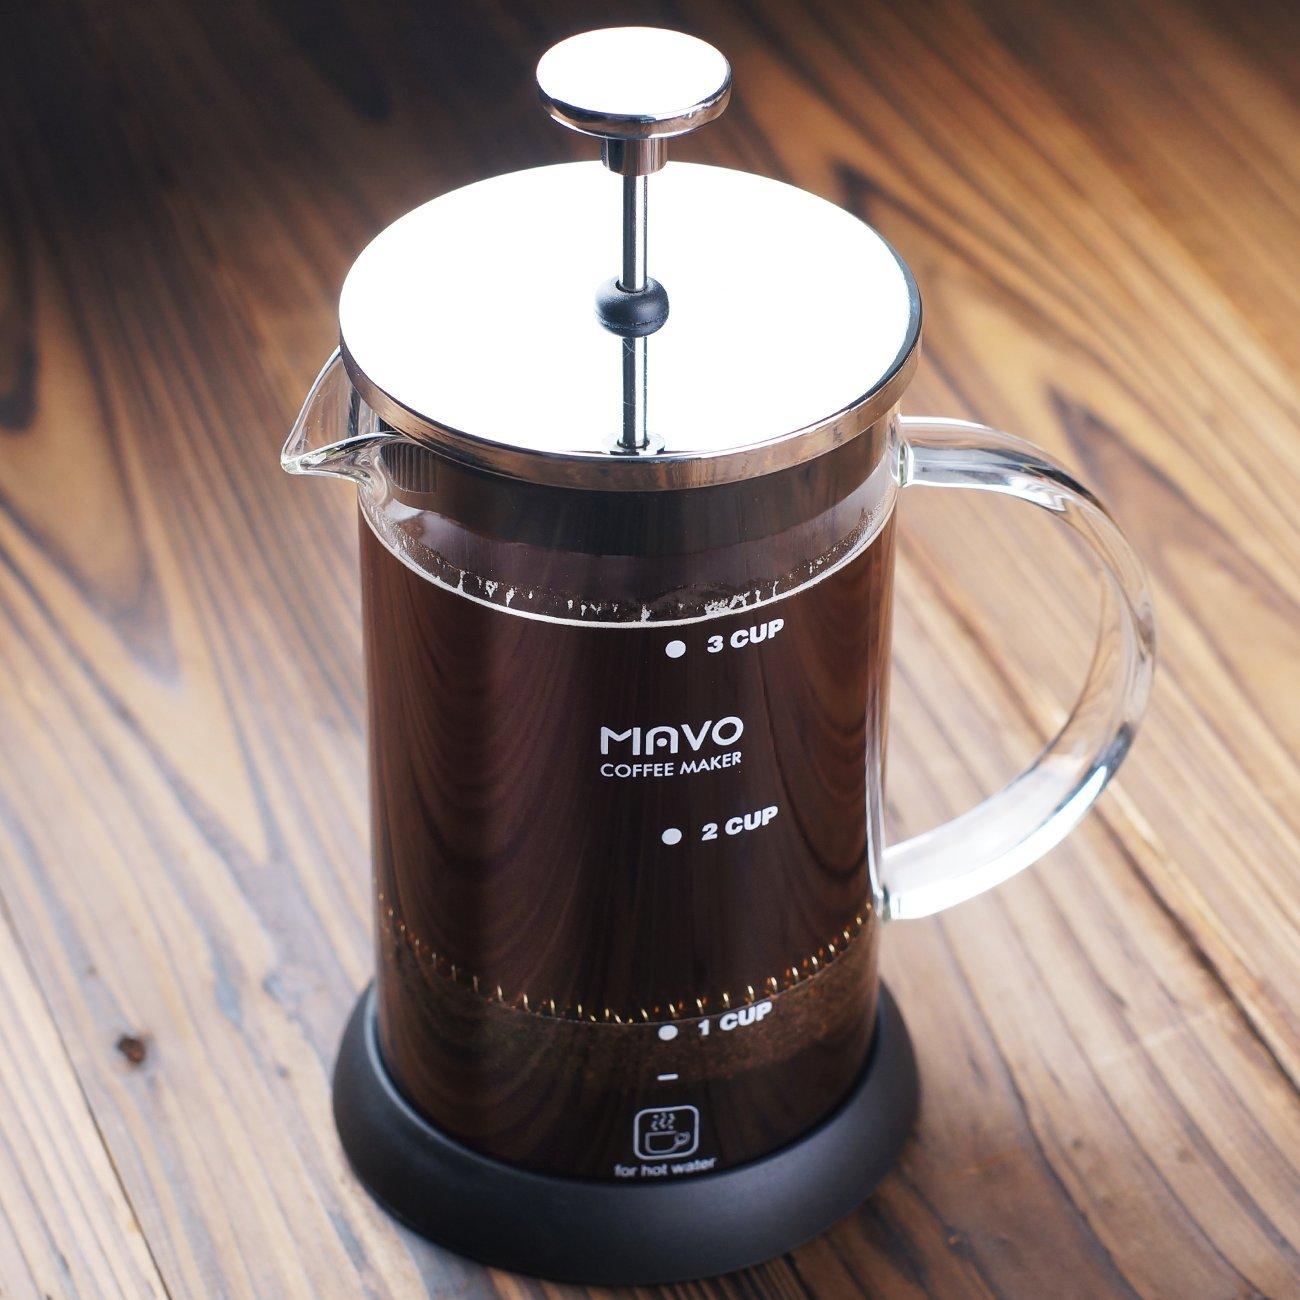 Decen 3 Cup Cafetière French Coffee Press Tea Press Stainless Steel Coffee Pot (600ML) WorldWind